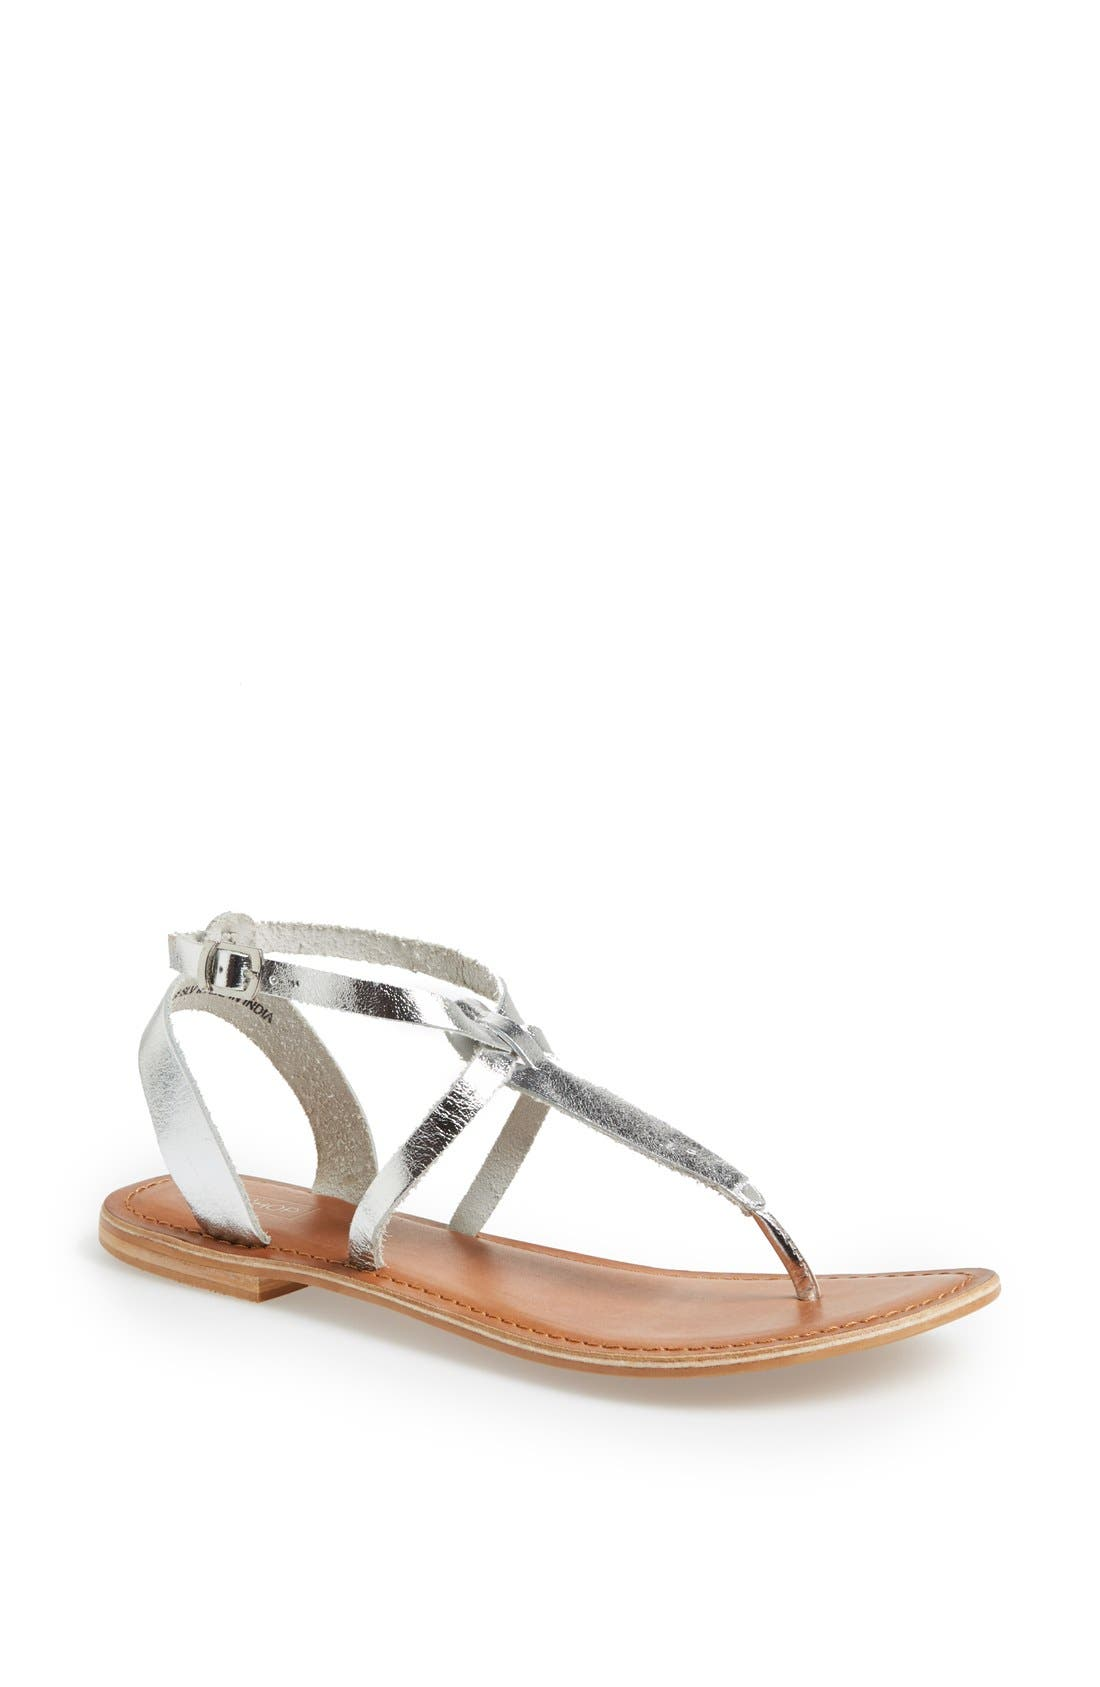 Alternate Image 1 Selected - Topshop 'Horizon' Leather Sandal